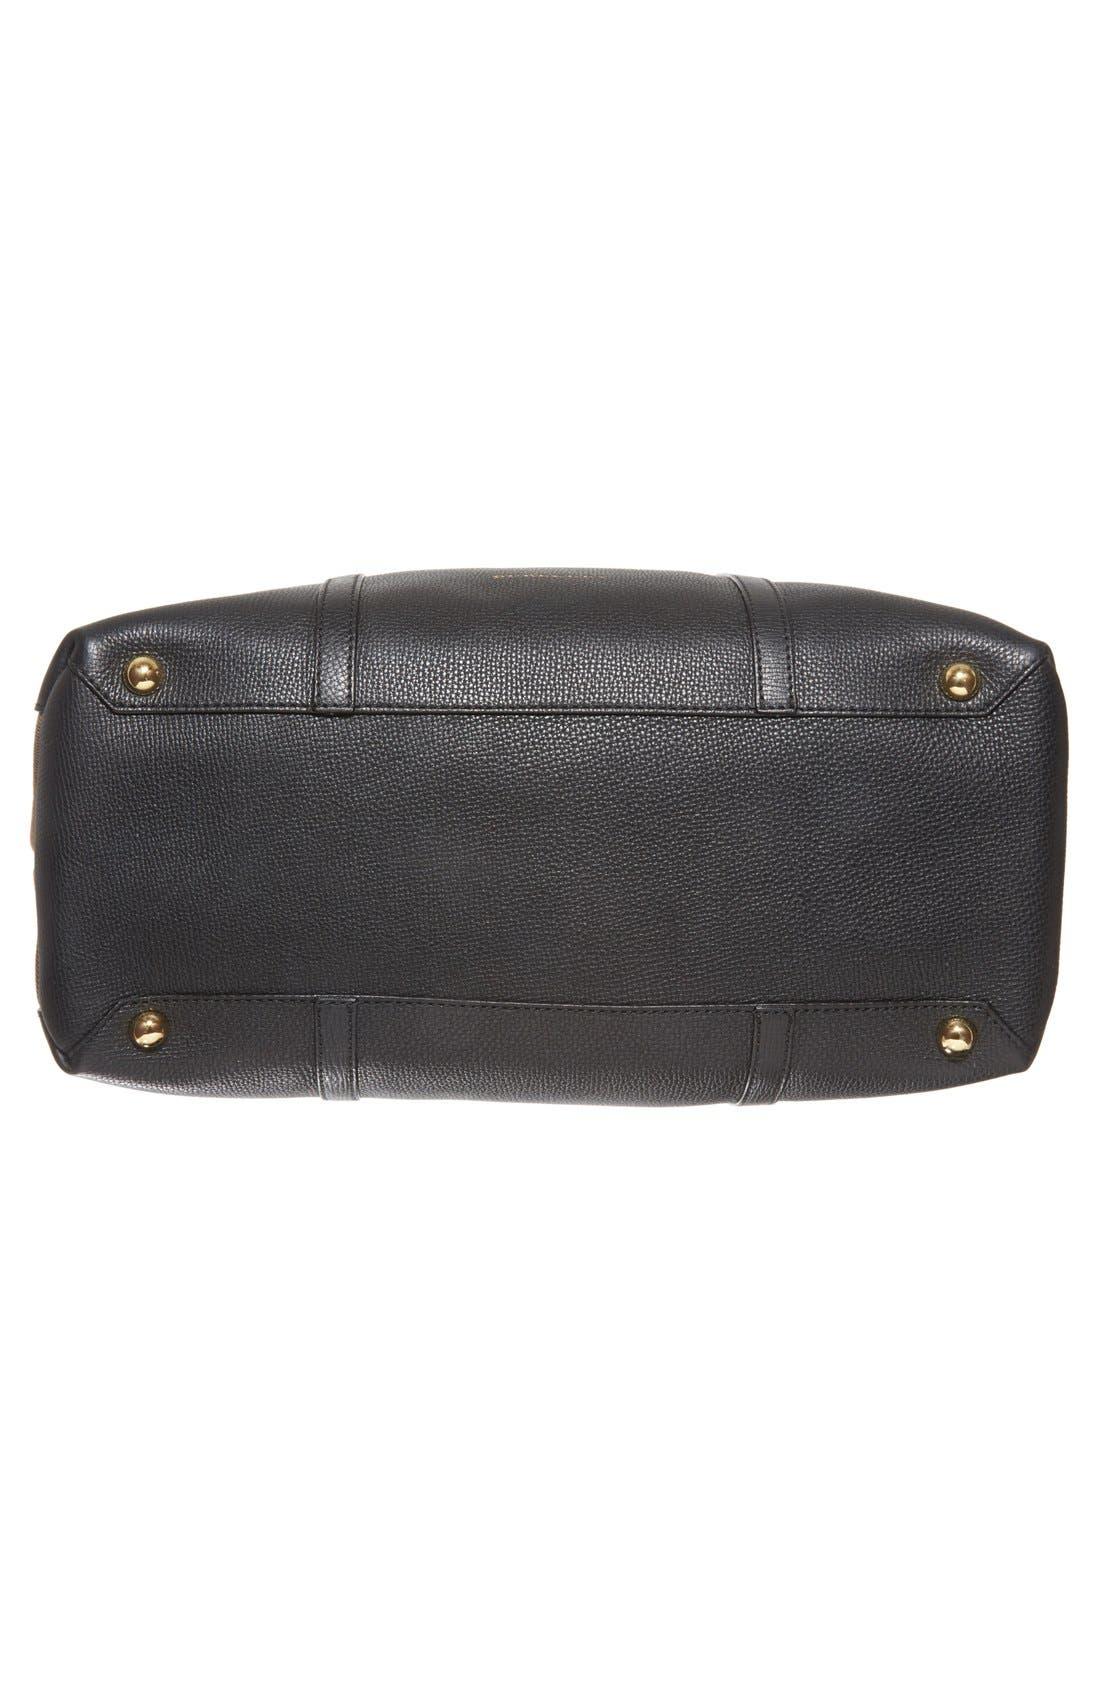 'Mason - House Check' Diaper Bag,                             Alternate thumbnail 6, color,                             Black